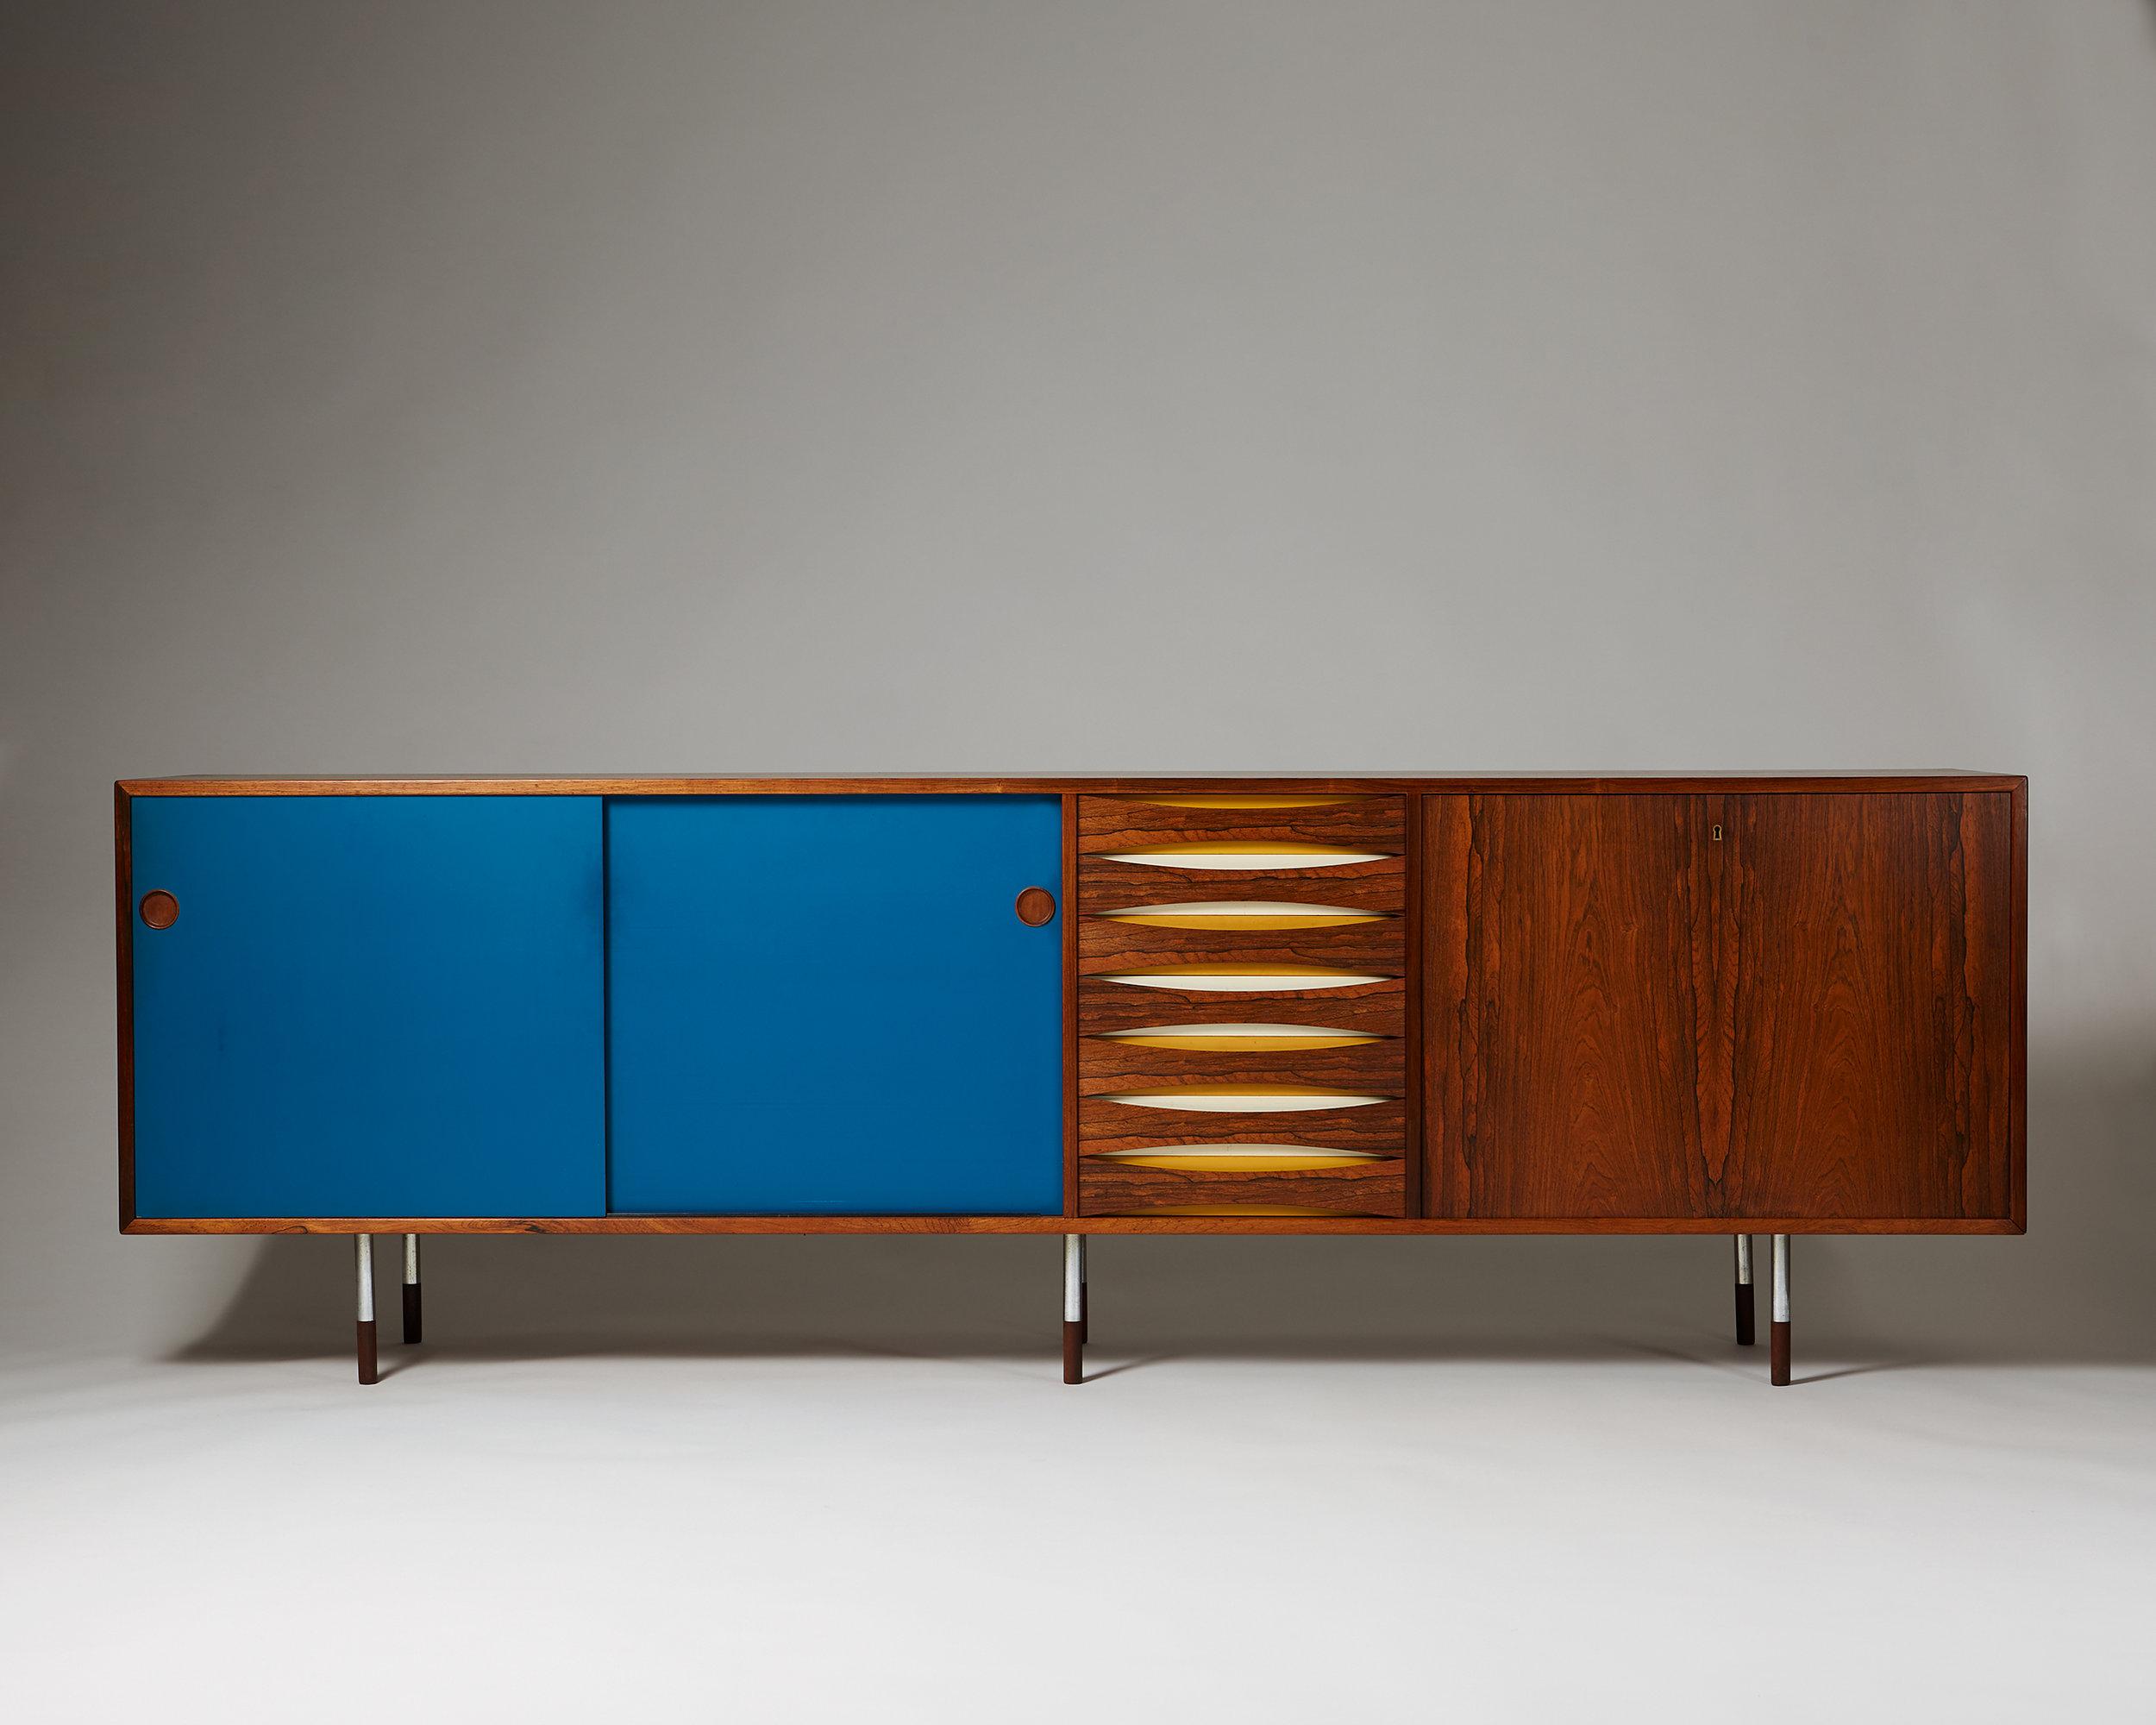 Arne Vodder  Sideboard, Credenza, model 29A  Denmark, 1958-1959  Rosewood, paint and steel 80,5 x 250 x 47 cm